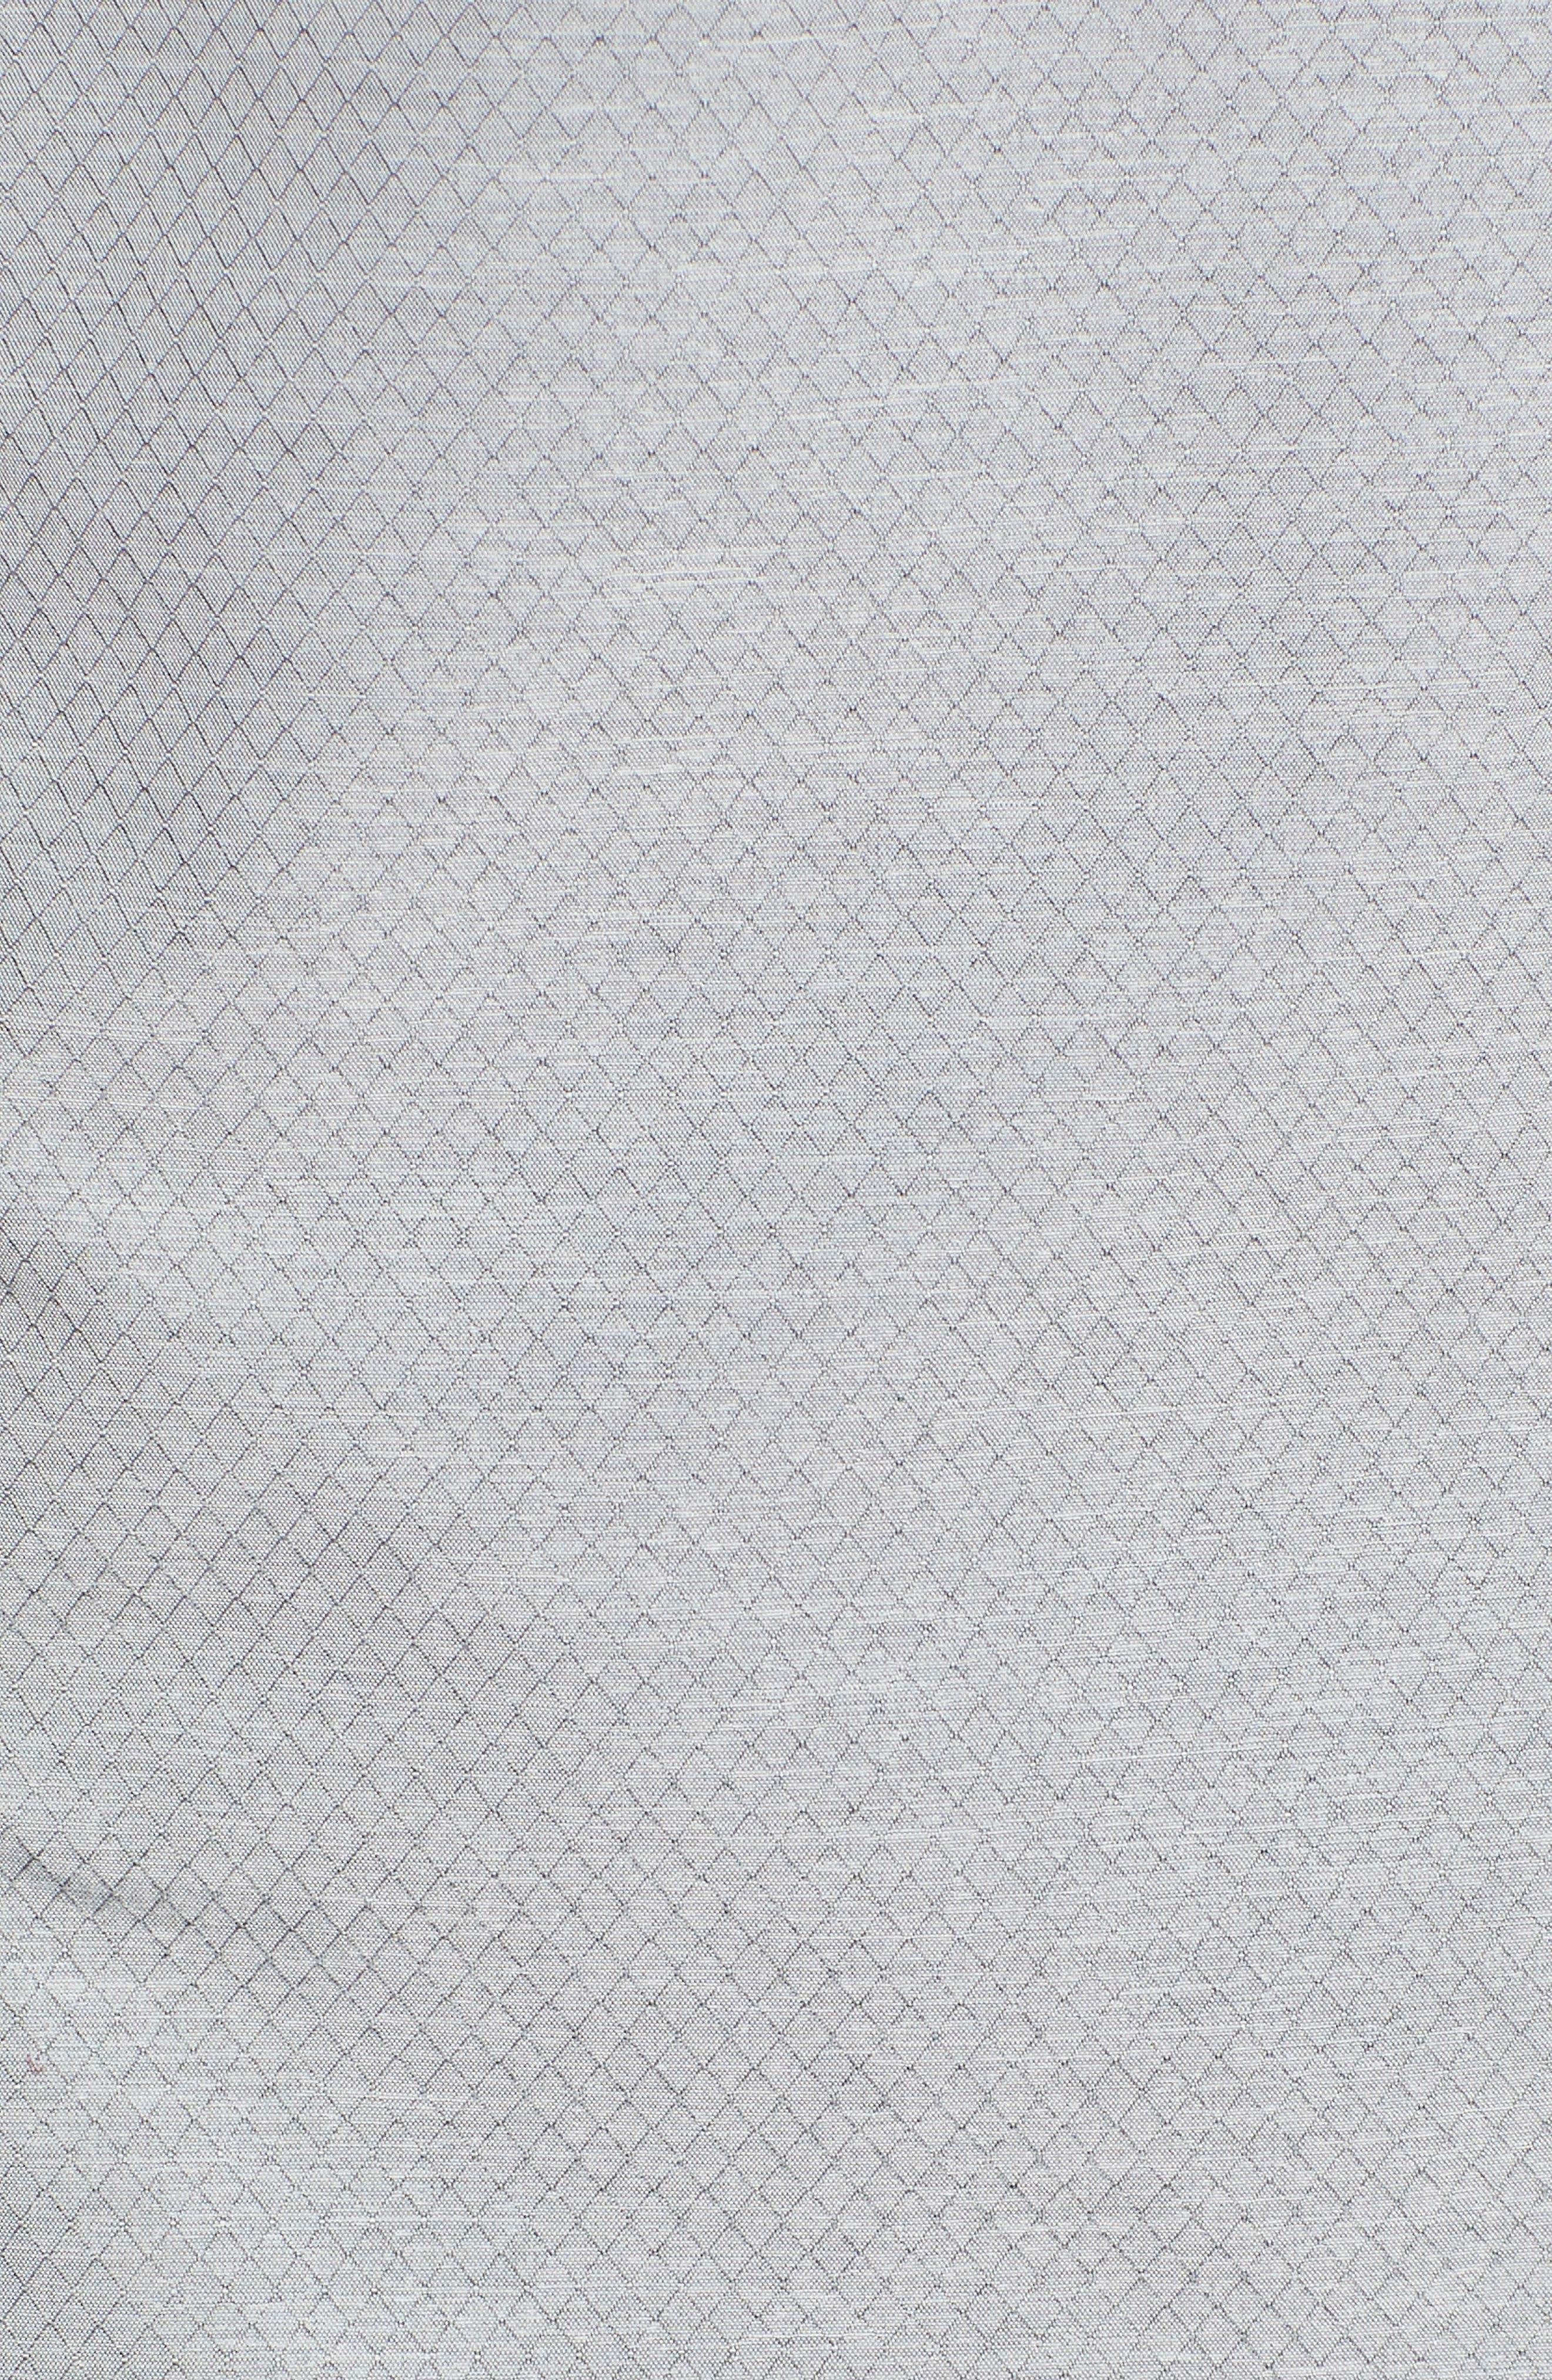 oyage Wind Hooded Jacket,                             Alternate thumbnail 7, color,                             LIGHT GREY CROSSHATCH